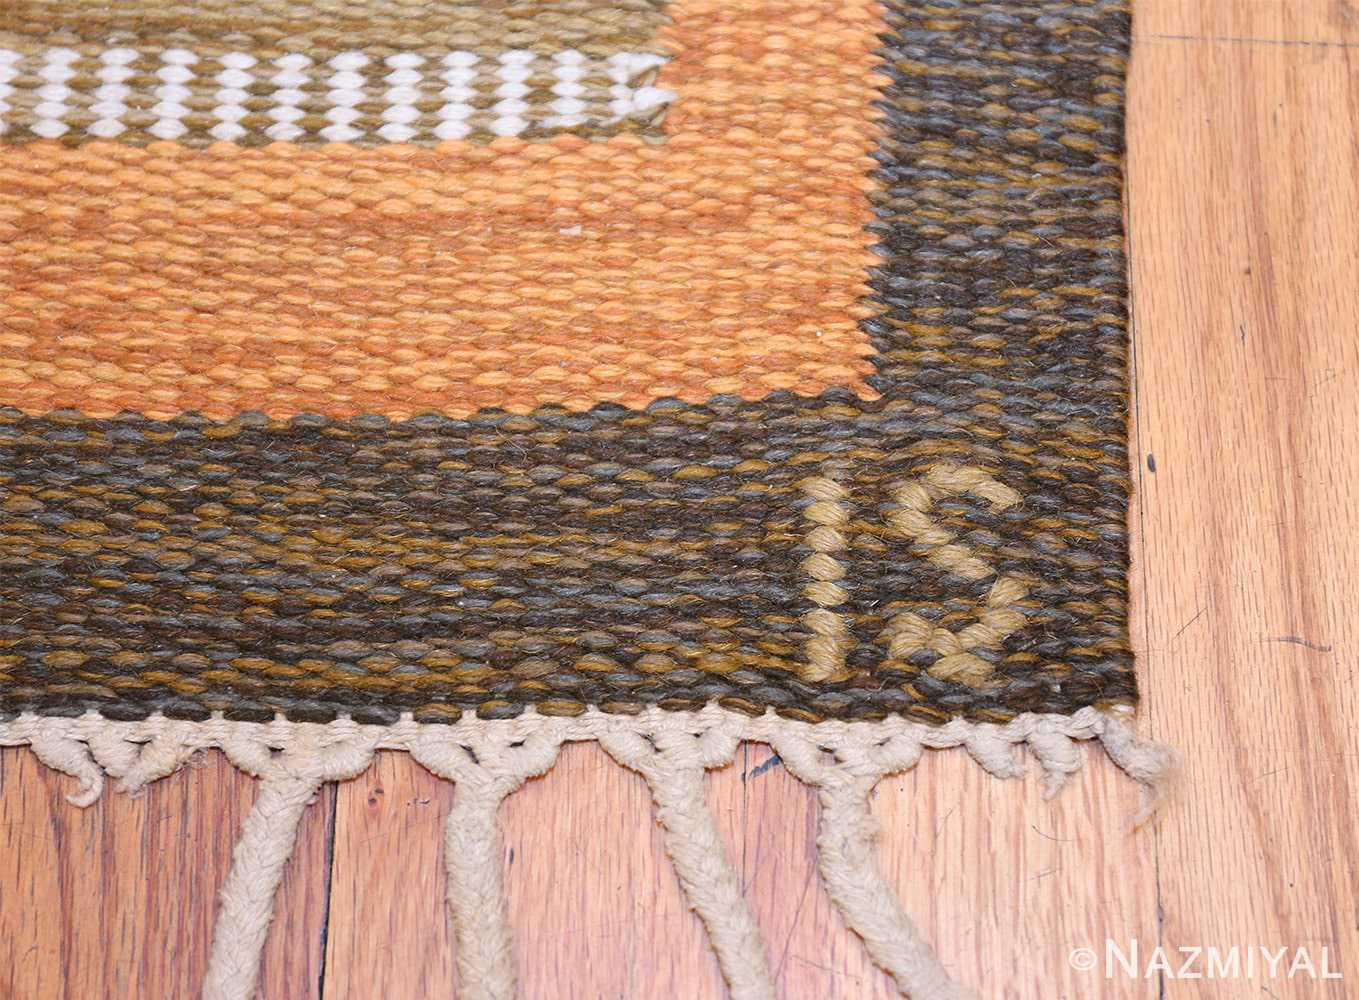 Vintage Swedish Kilim by Ingegerd Silow 48511 Signature Initials Nazmiyal